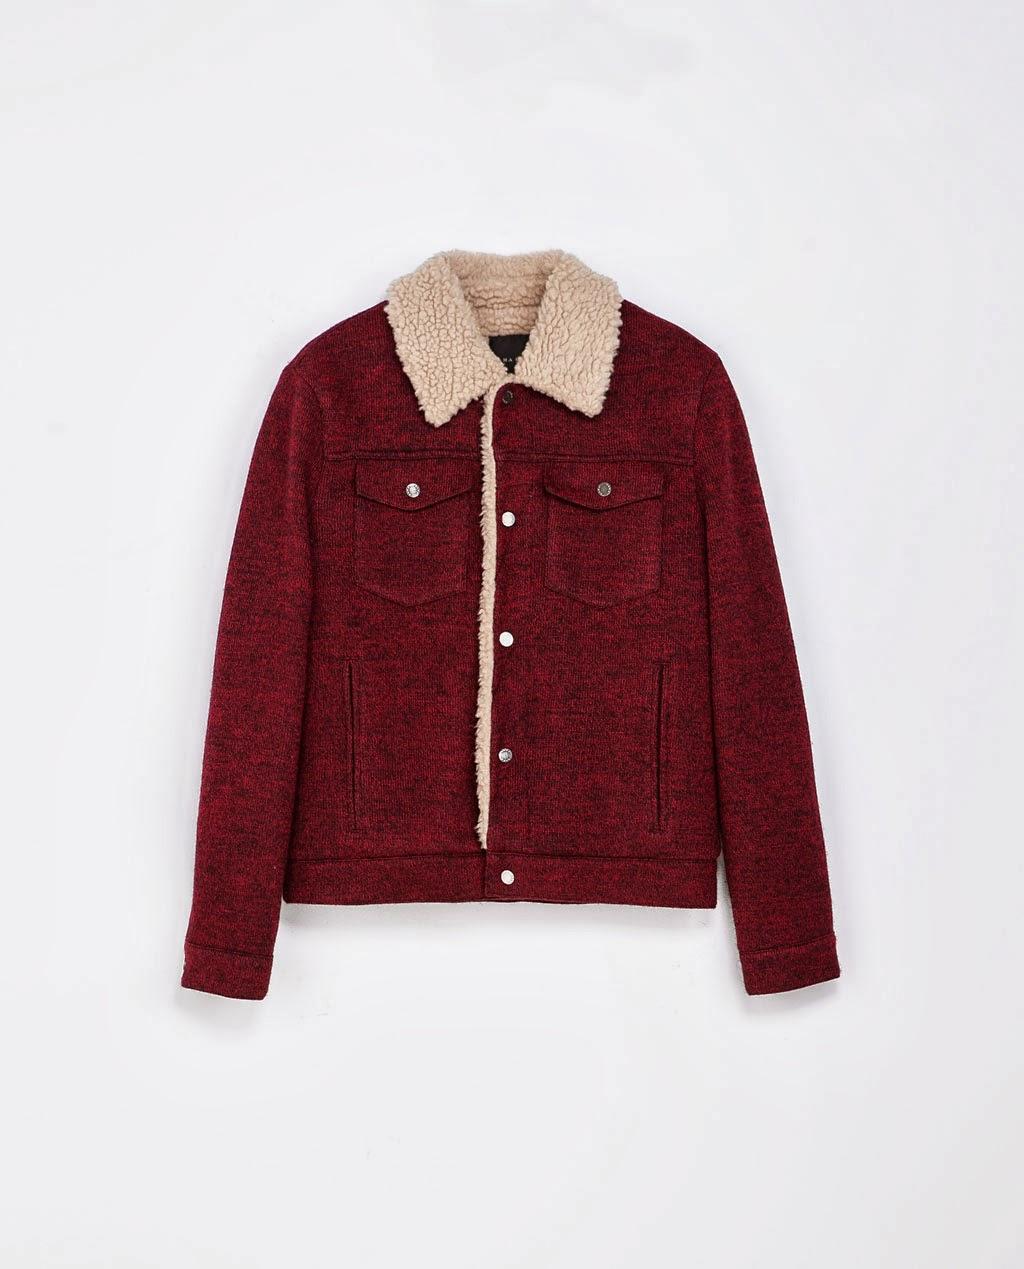 6 Moda Zara Jackets 2014 For Men Fleece Jacket